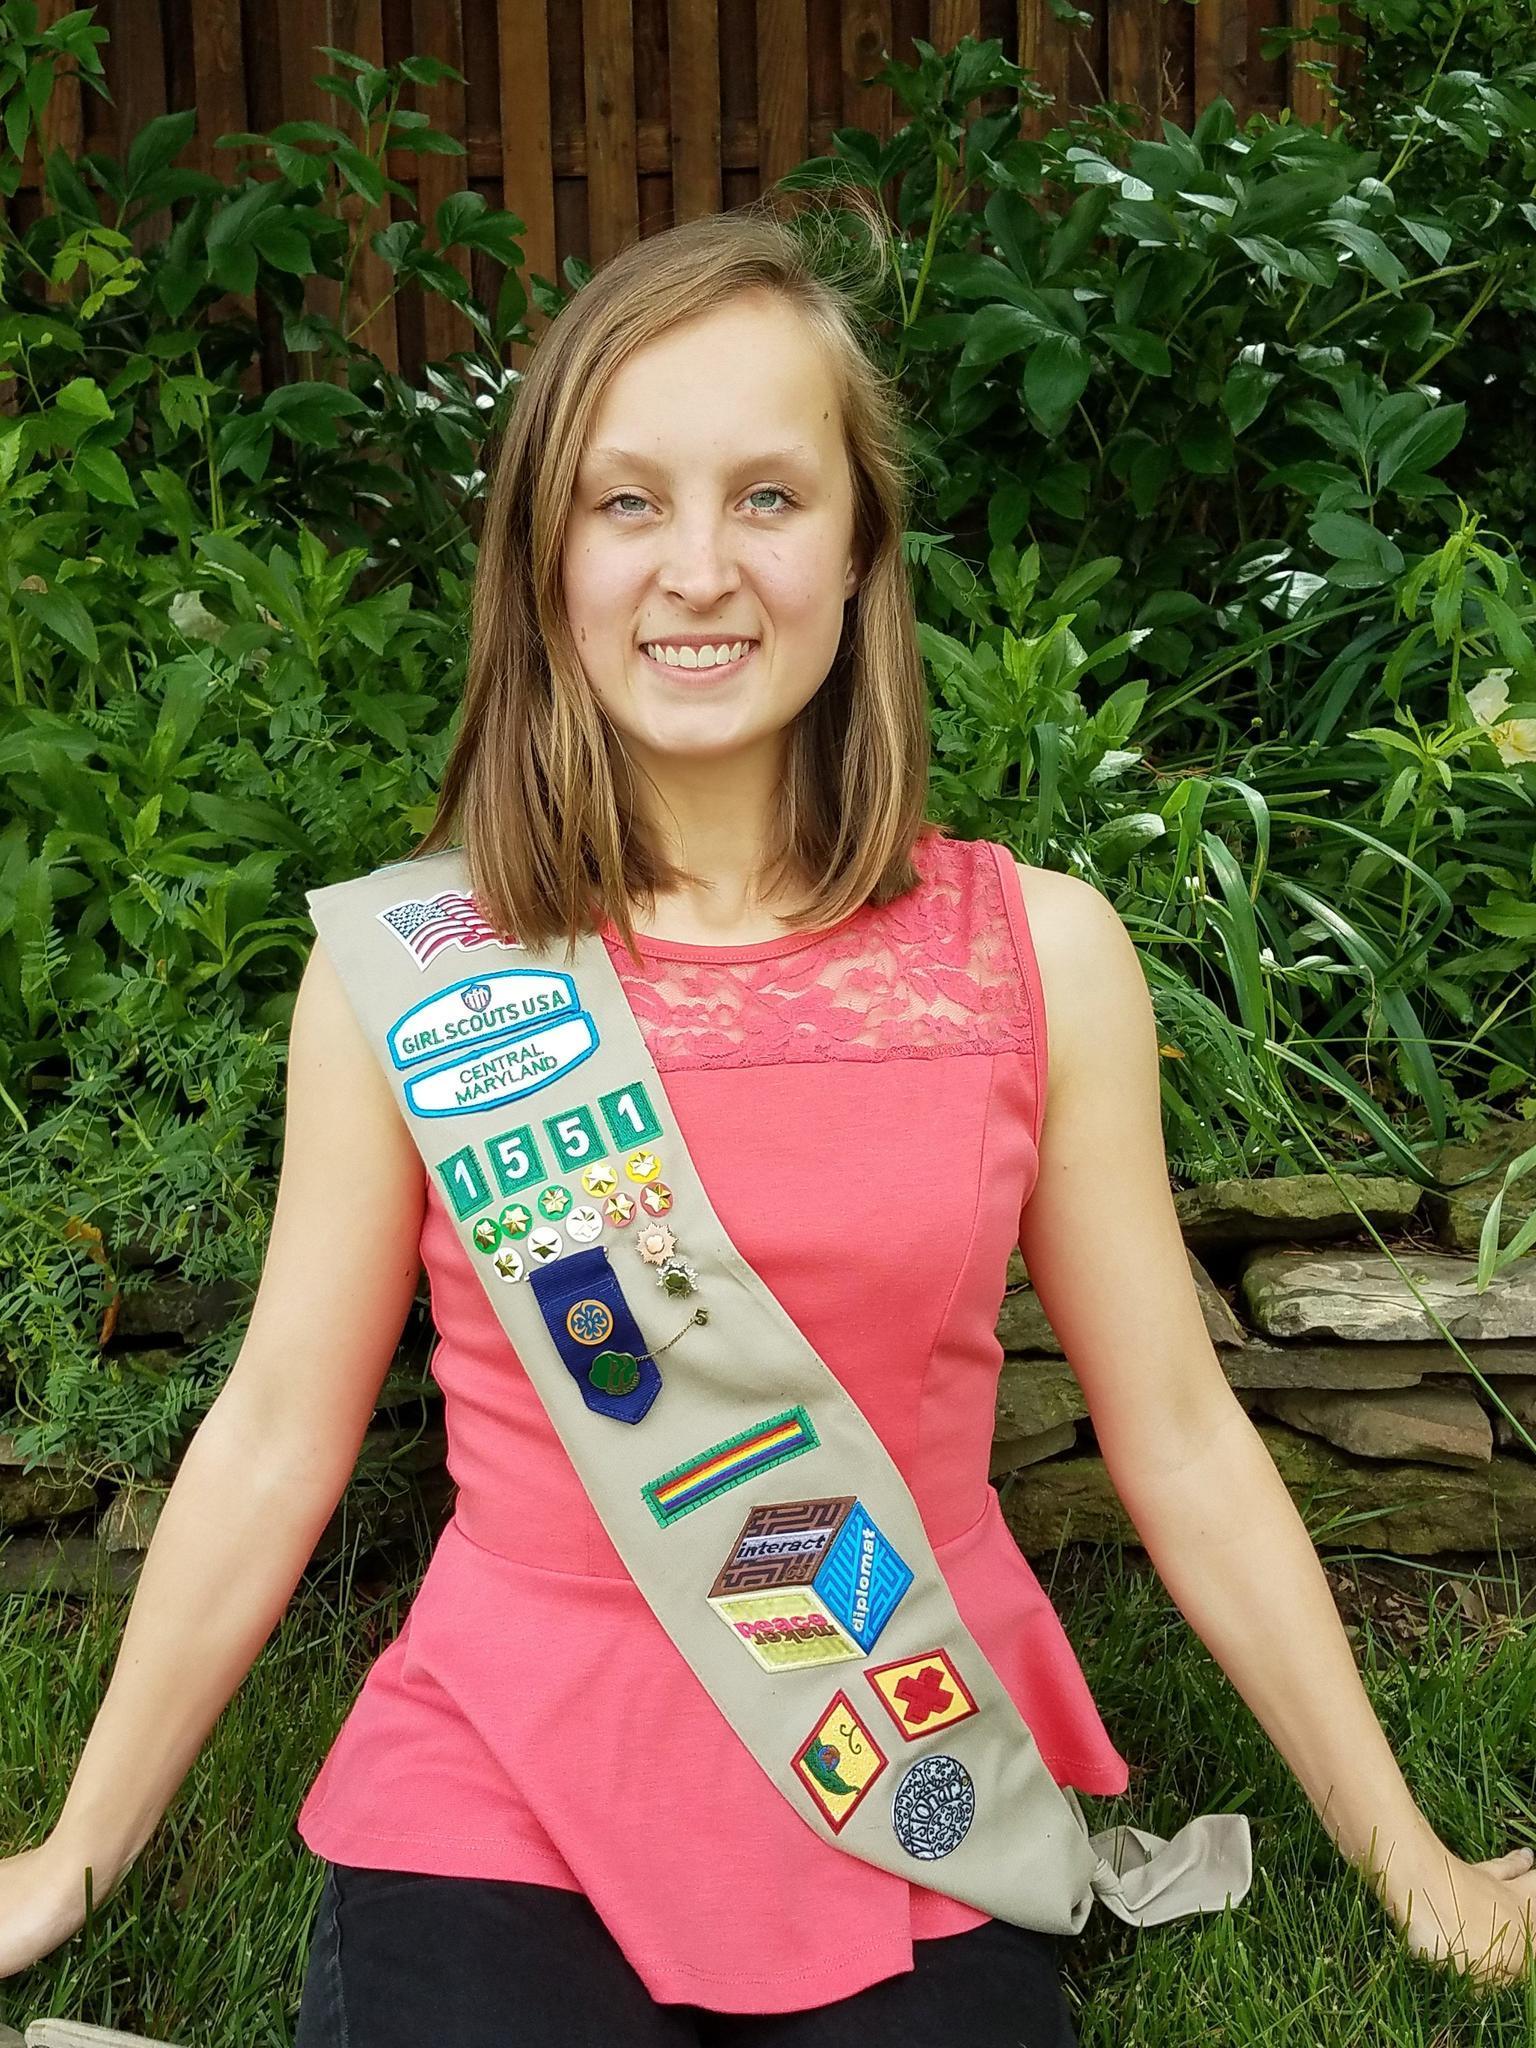 crofton odenton arundel high junior  pletes girl scout